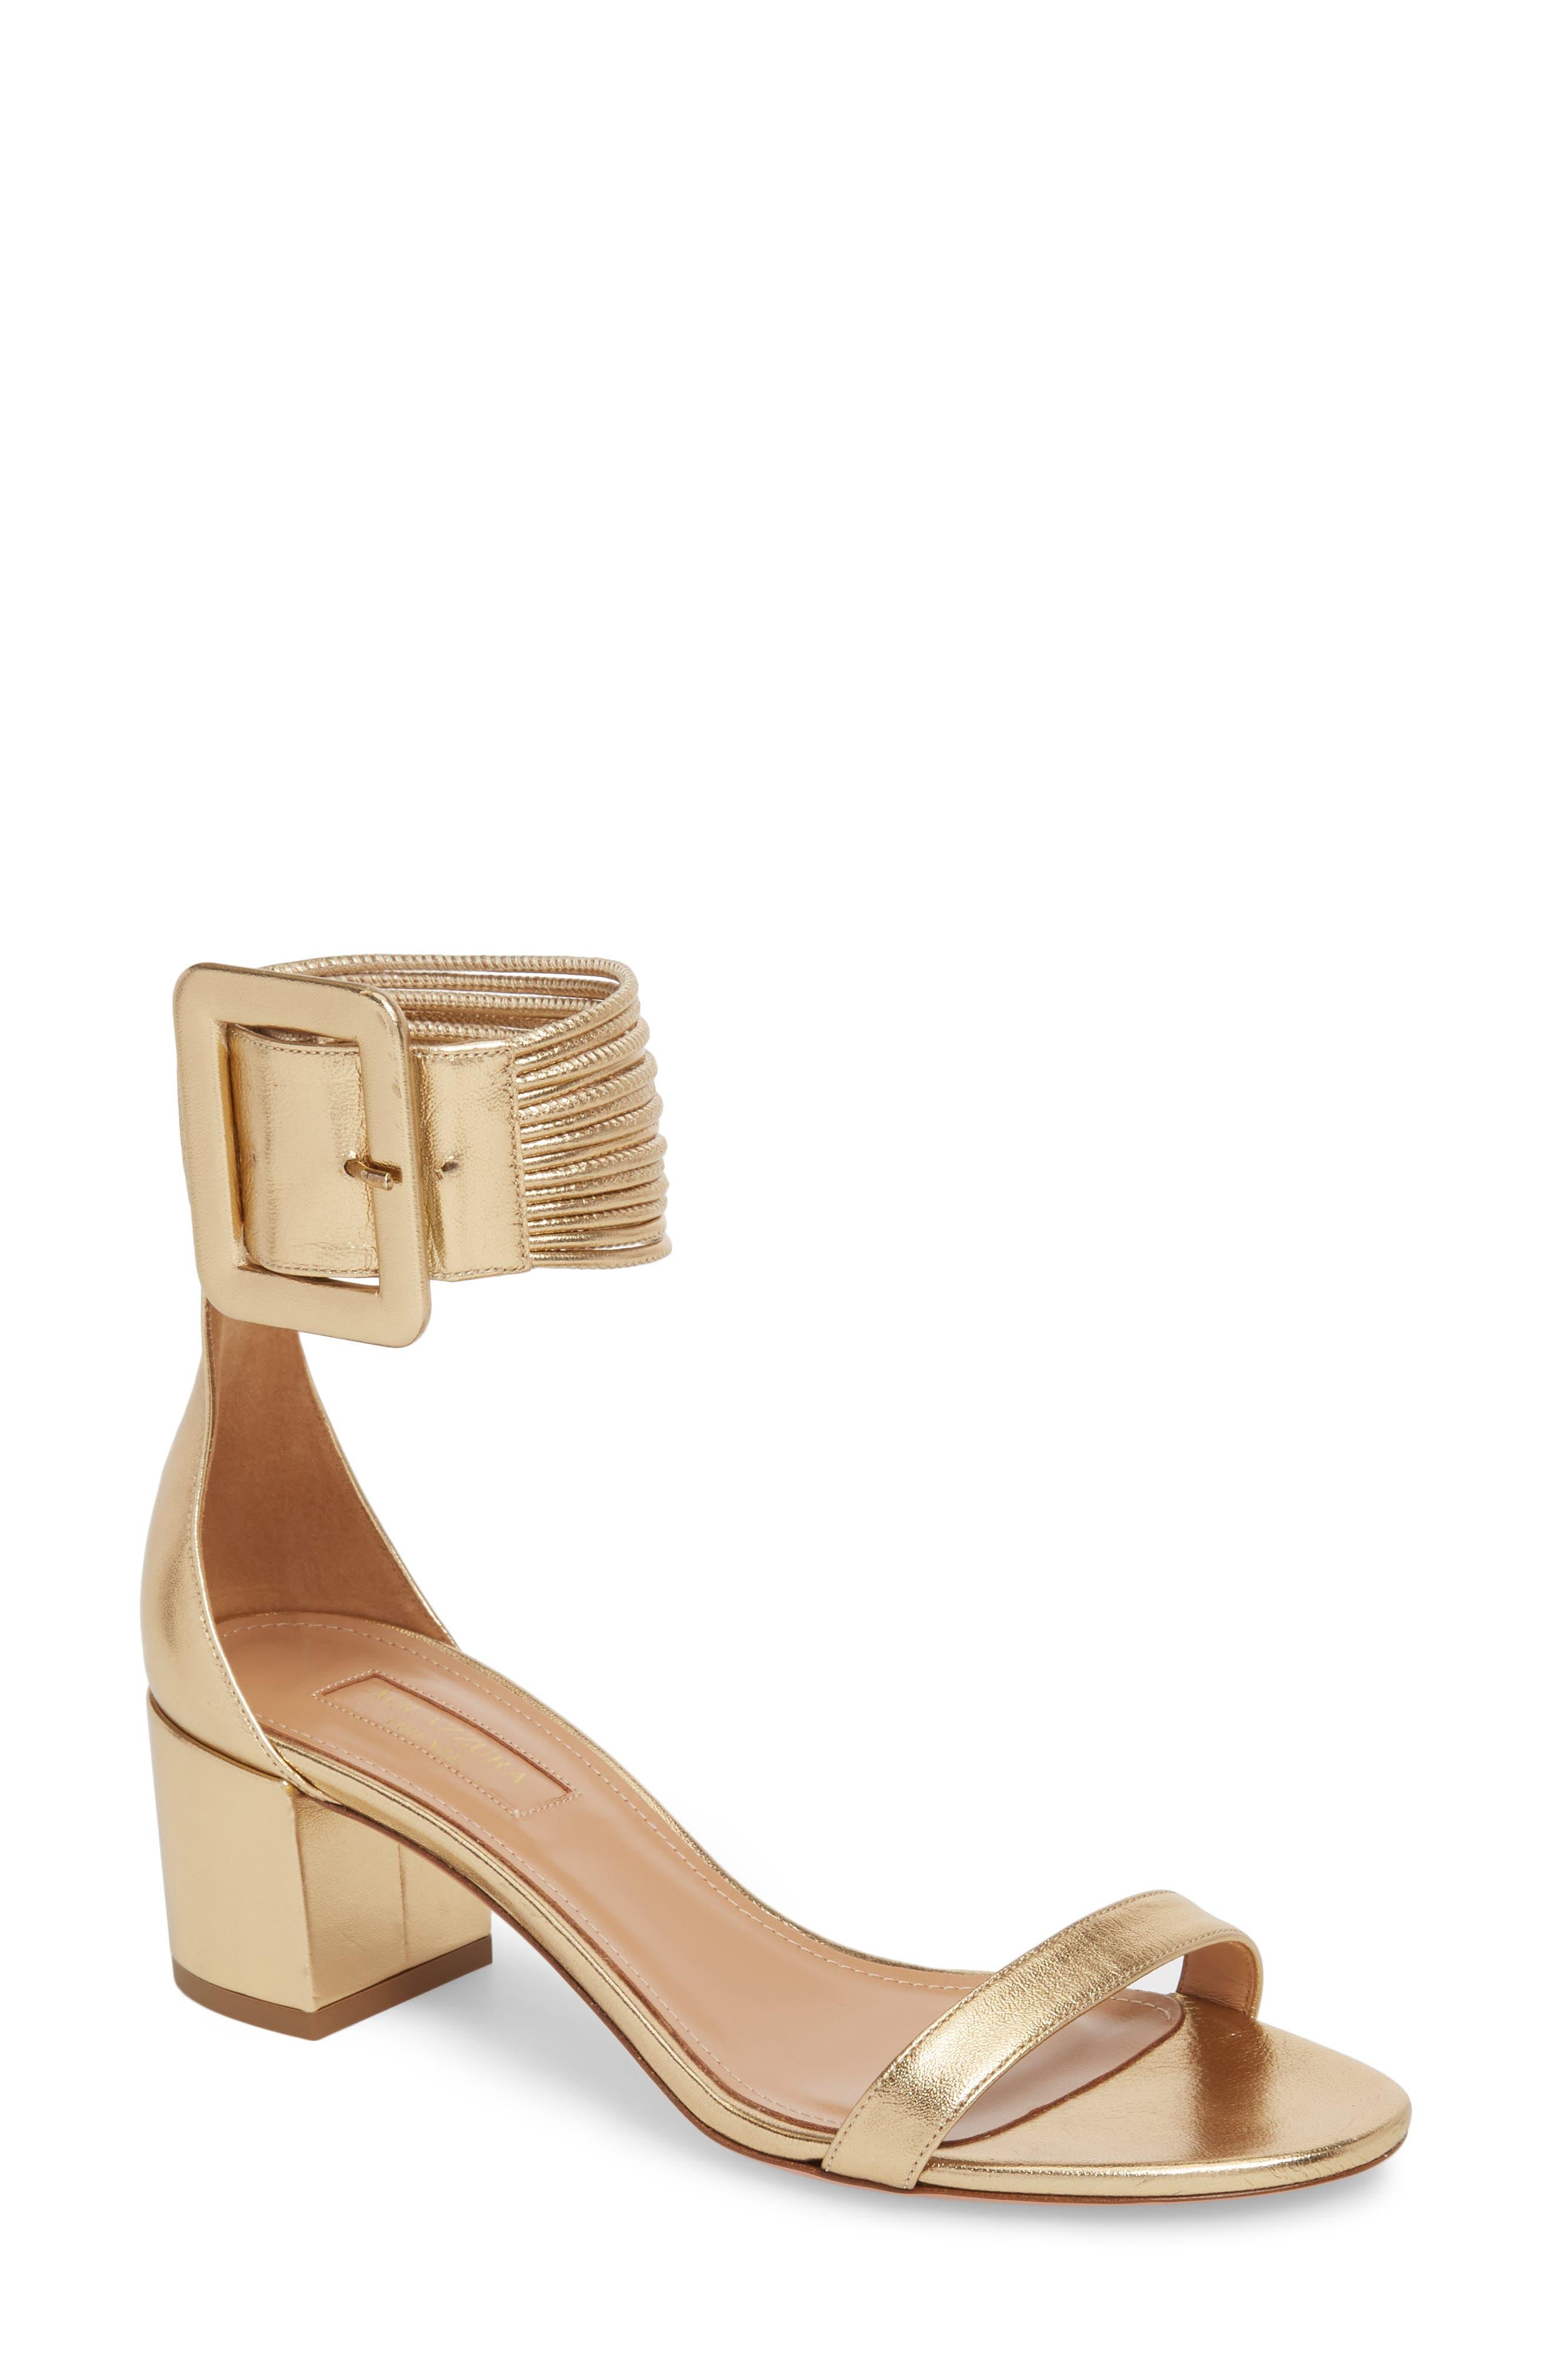 Casablanca Ankle Cuff Sandal,                         Main,                         color, SOFT GOLD